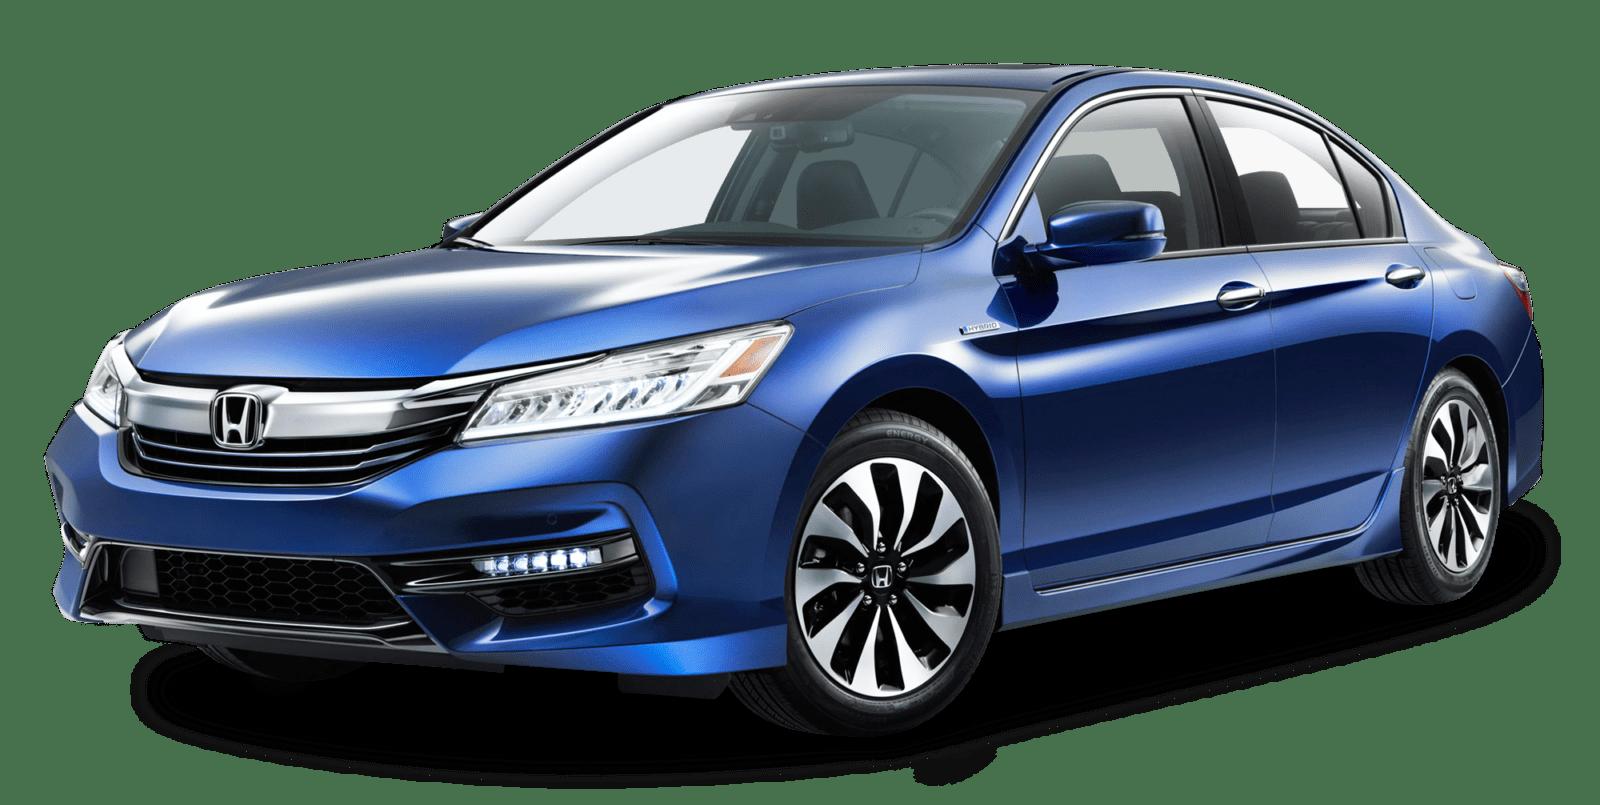 purepng.com-blue-honda-accord-hybrid-carcarvehicletransporthonda-961524653570veqwm